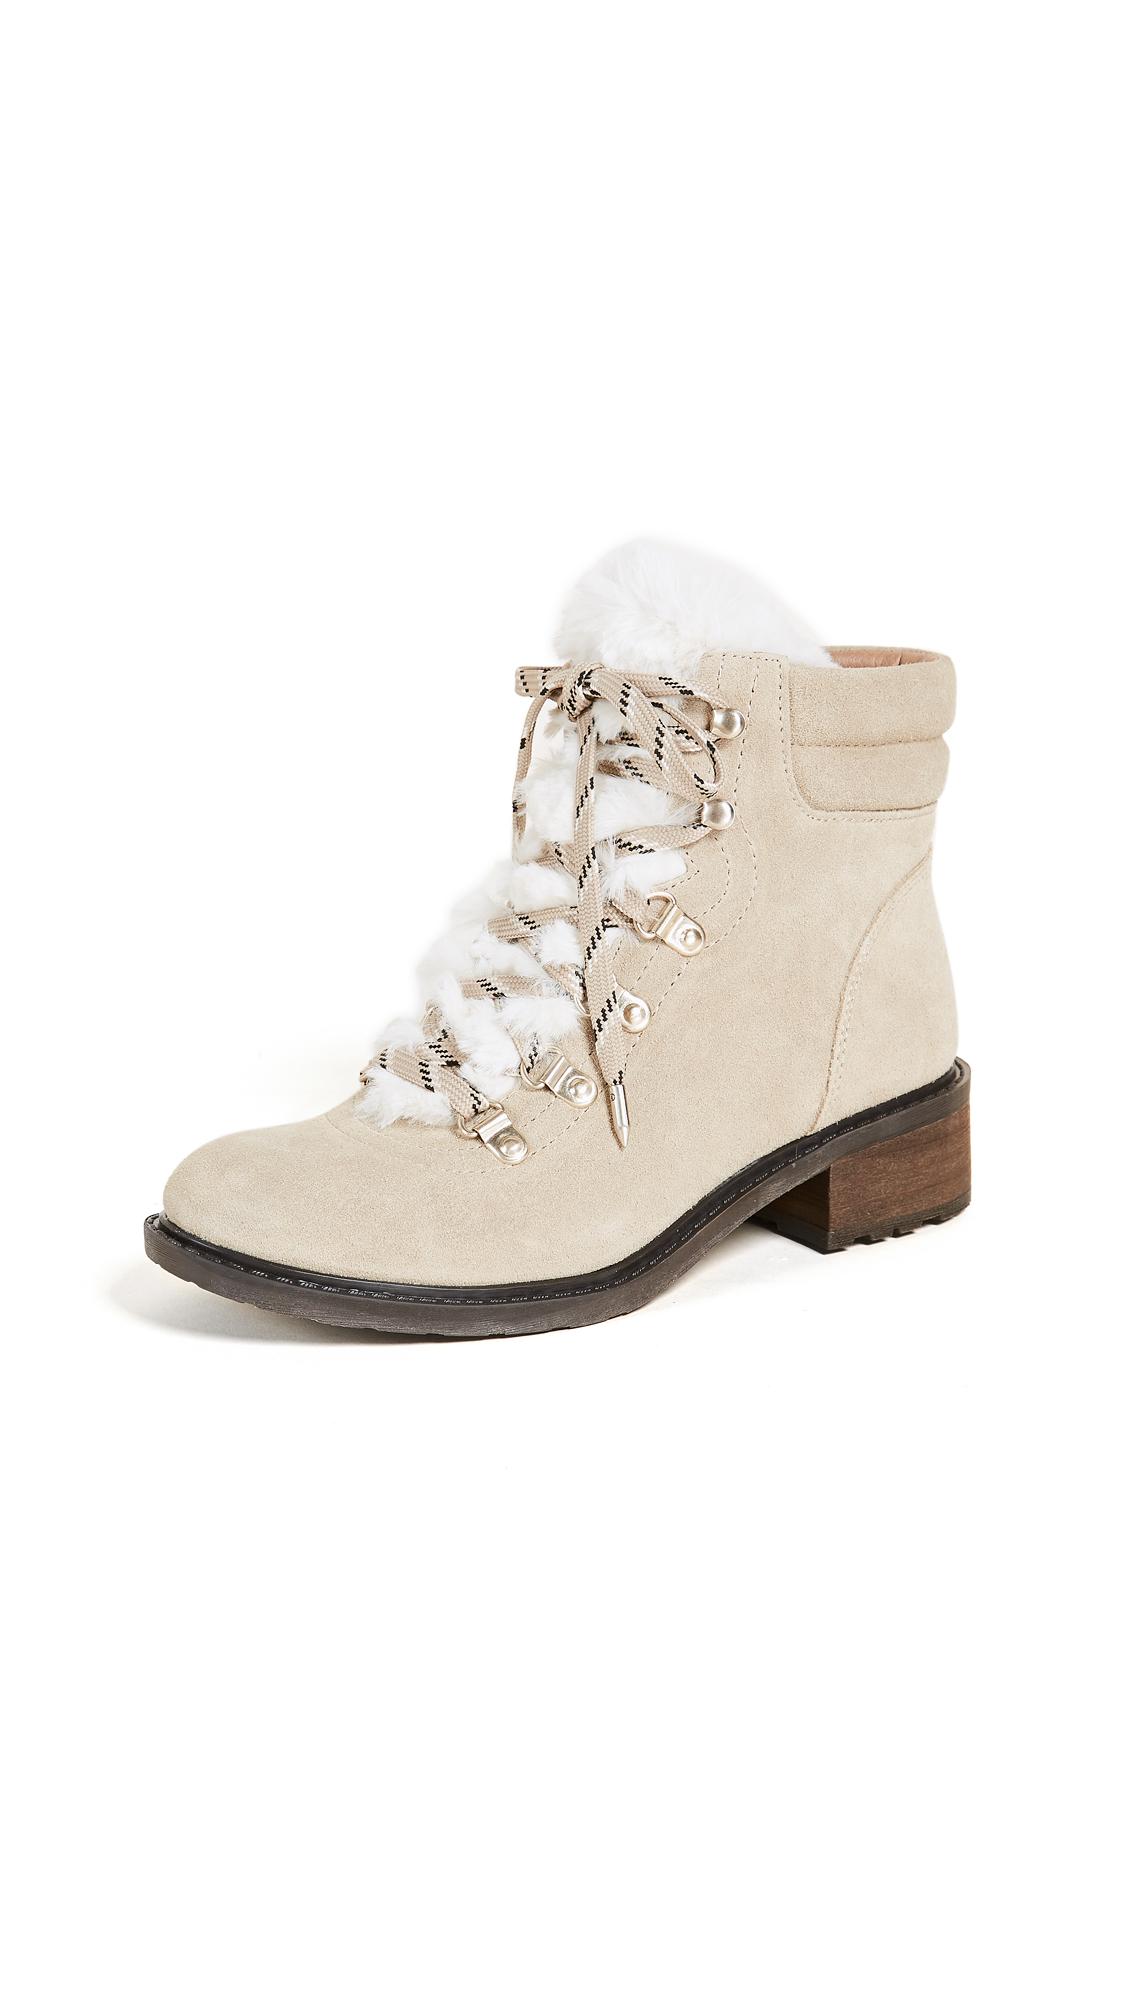 Sam Edelman Darrah 2 Hiker Boots - Desert/Off White